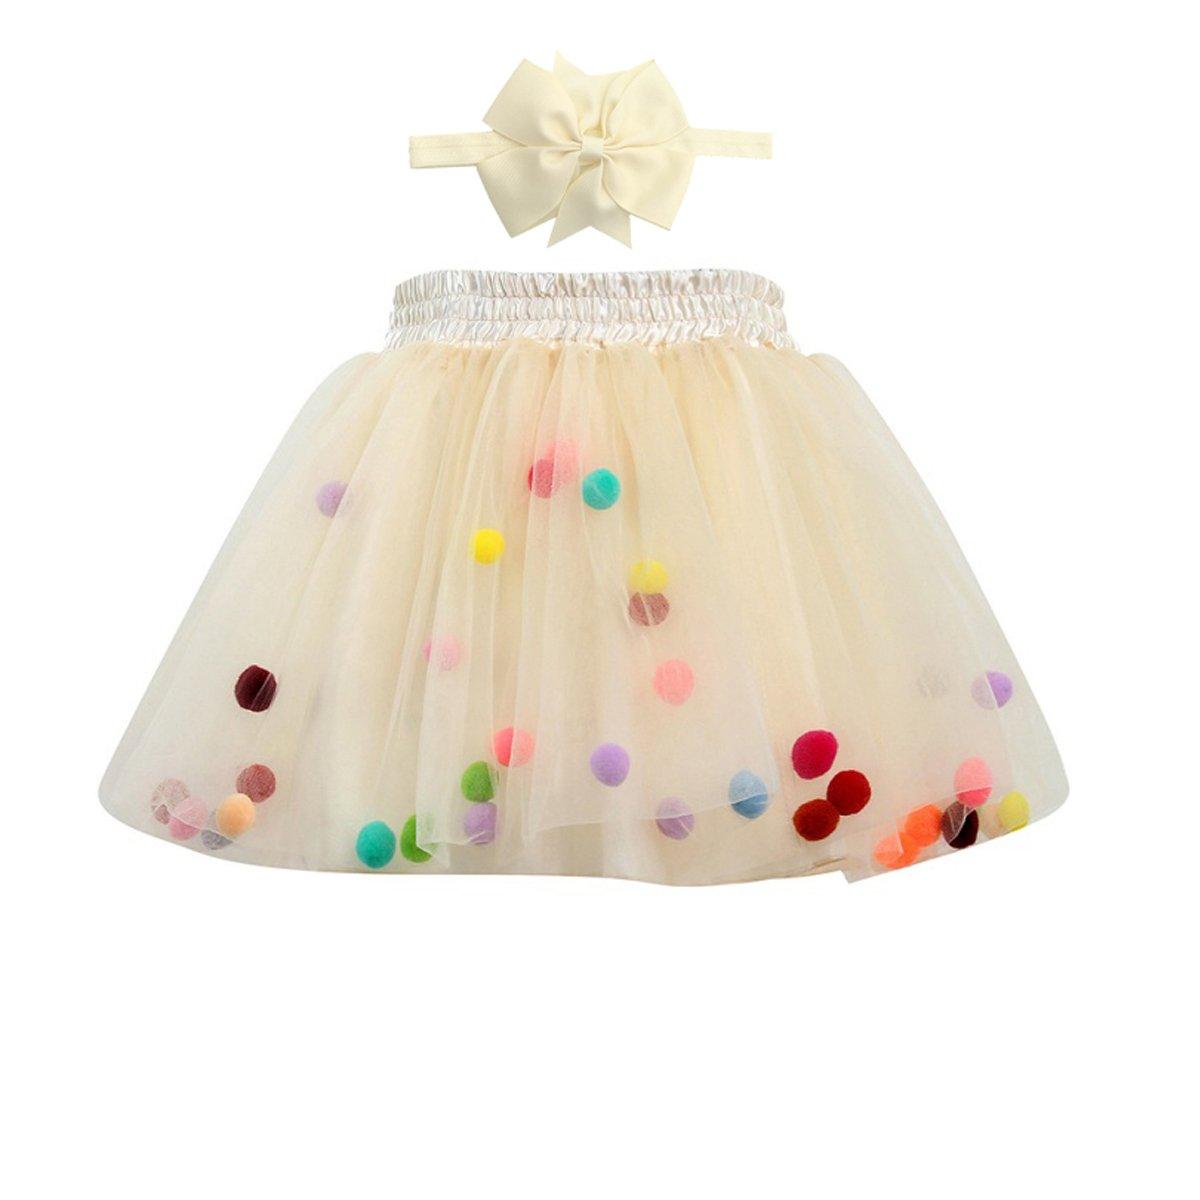 Girl's Tutu Skirt Baby Toddler 4 Layered Fluffy Ballet Dress Rainbow Pom Pom Puff Balls Pettiskirt with Headband